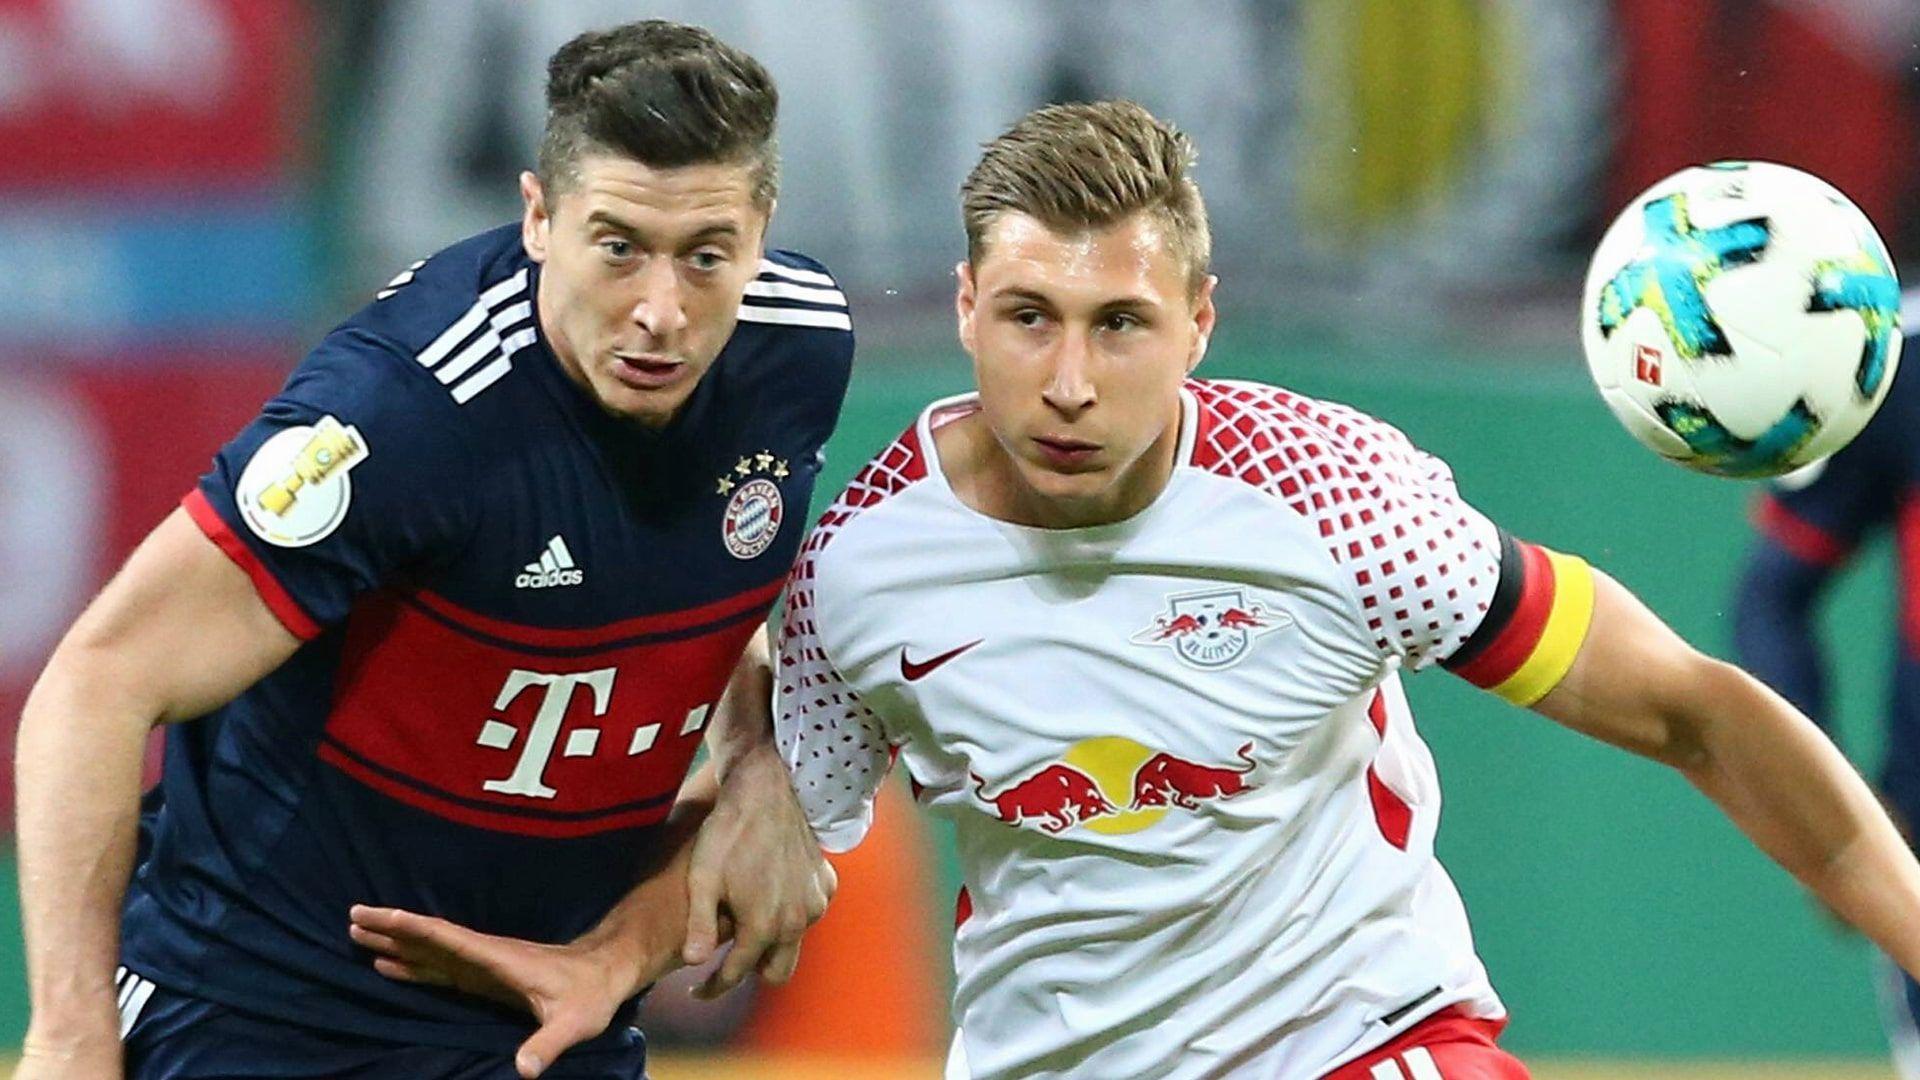 Rb Leipzig Vs Bayern Munich 25 05 2019 Preview Rb Leipzig Bayern Bayern Munich